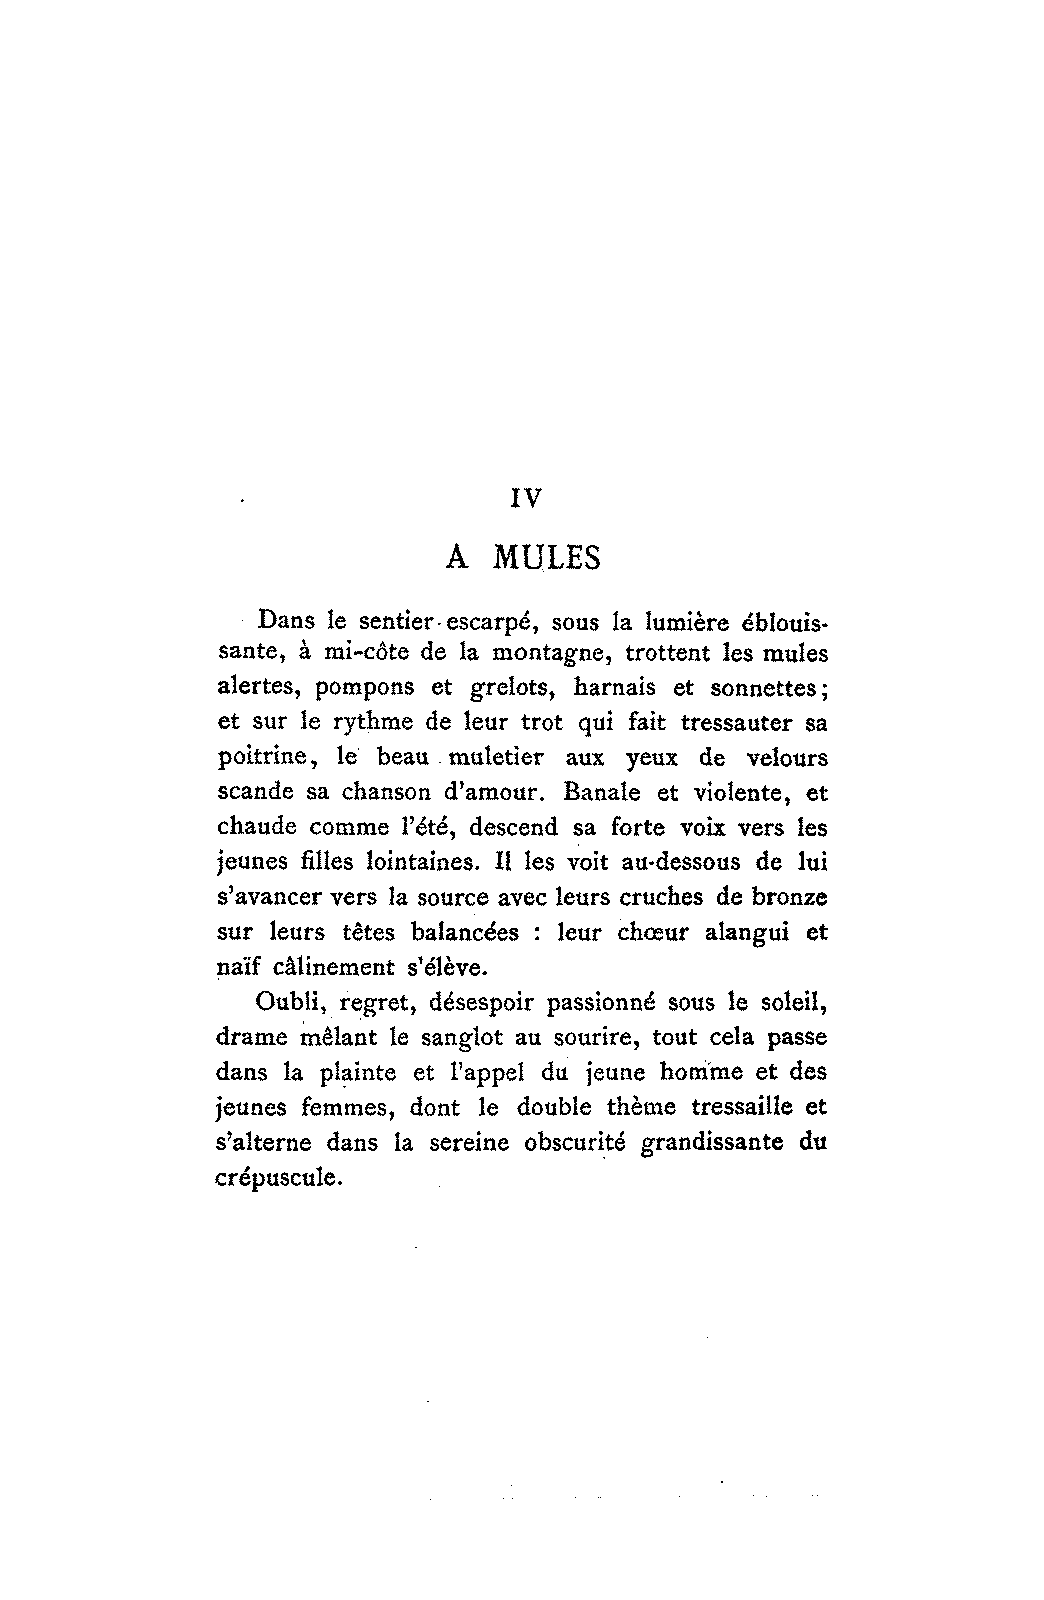 À mules (Charpentier, Gustave) - IMSLP/Petrucci Music Library: Free